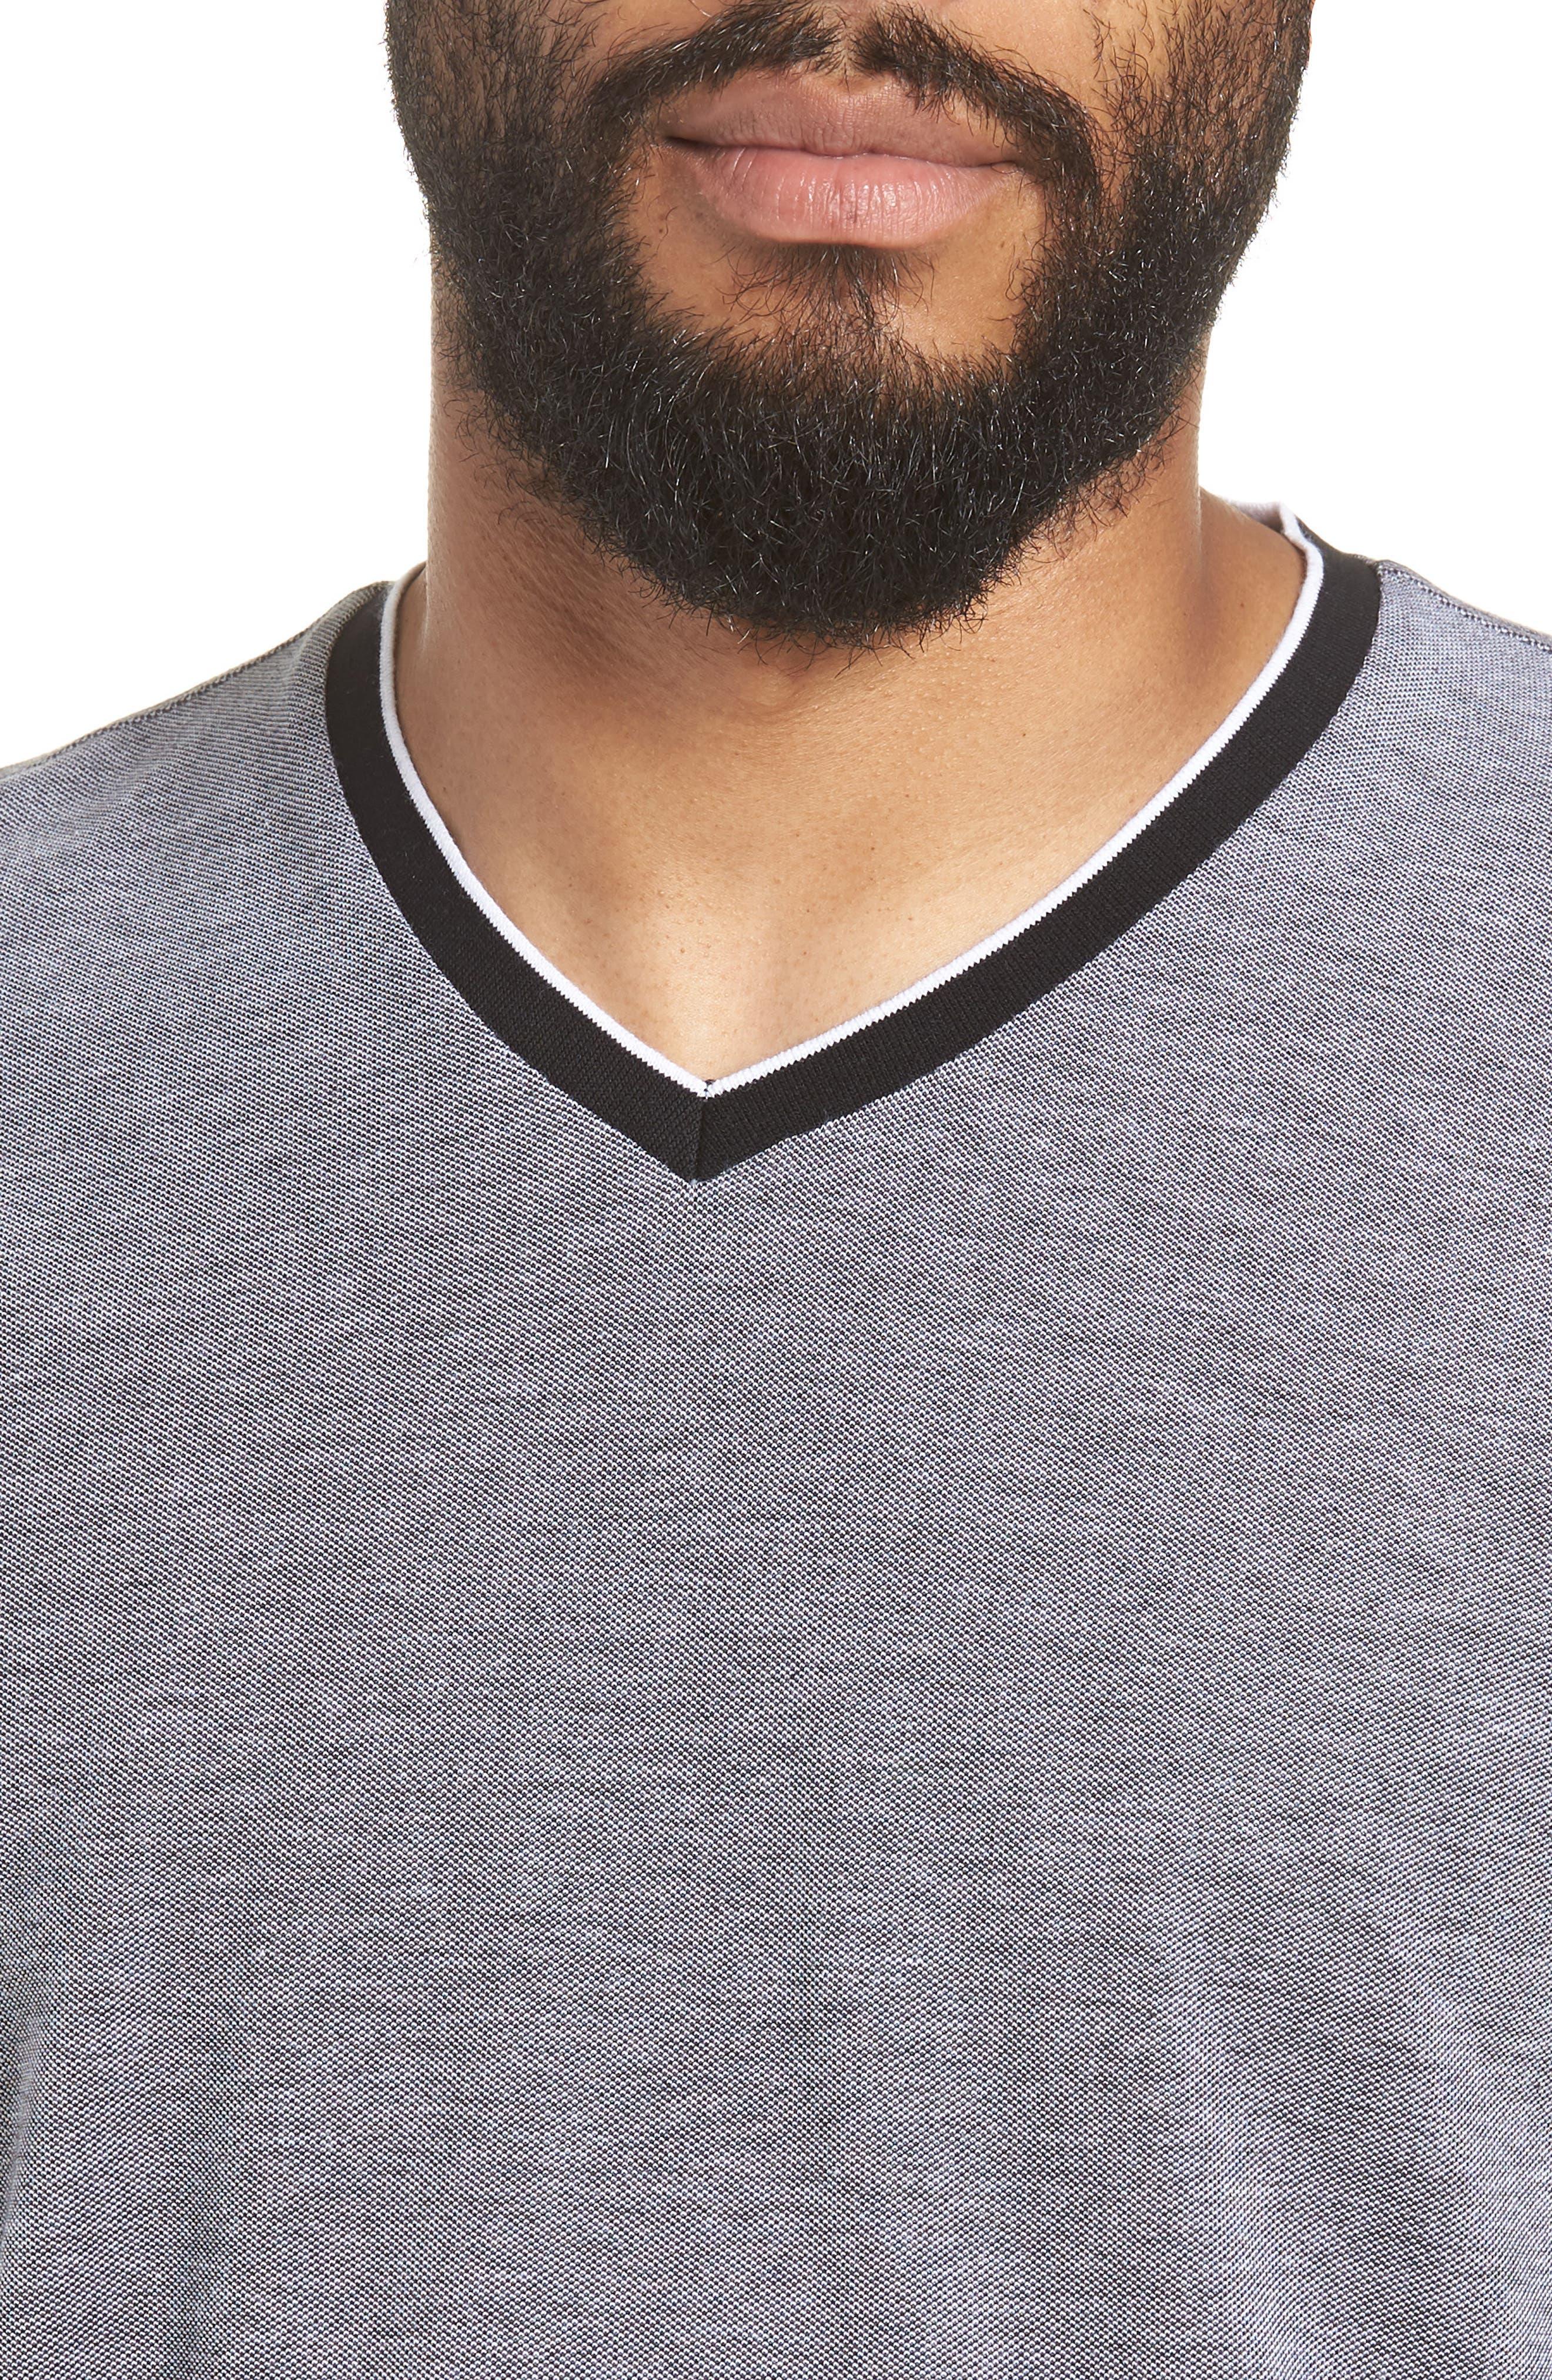 TIlson Regular Fit T-Shirt,                             Alternate thumbnail 4, color,                             Black